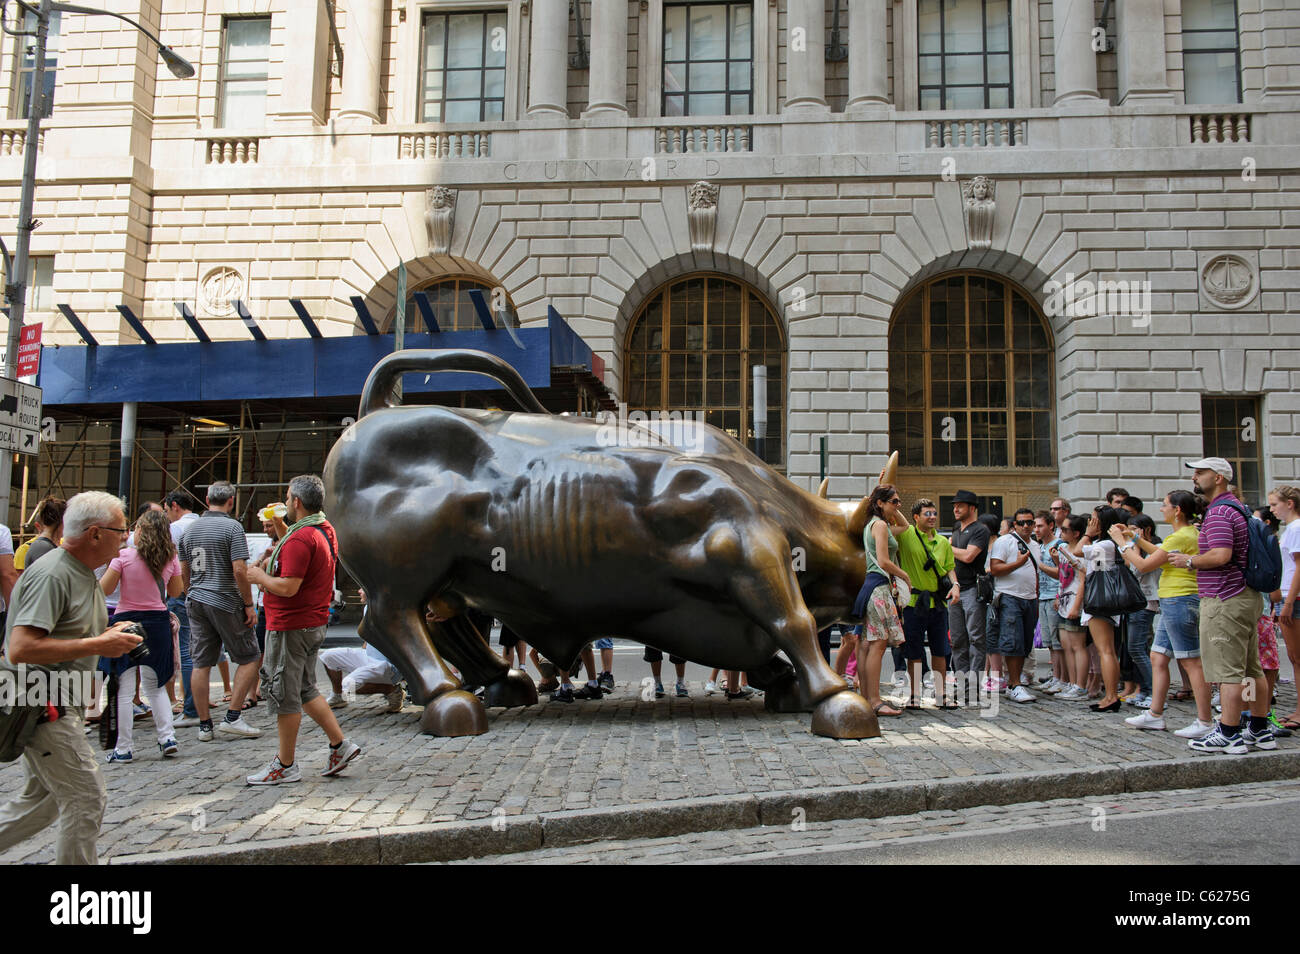 Bull charge, Bowling Green Park, New York, Manhattan, États-Unis. Photo Stock